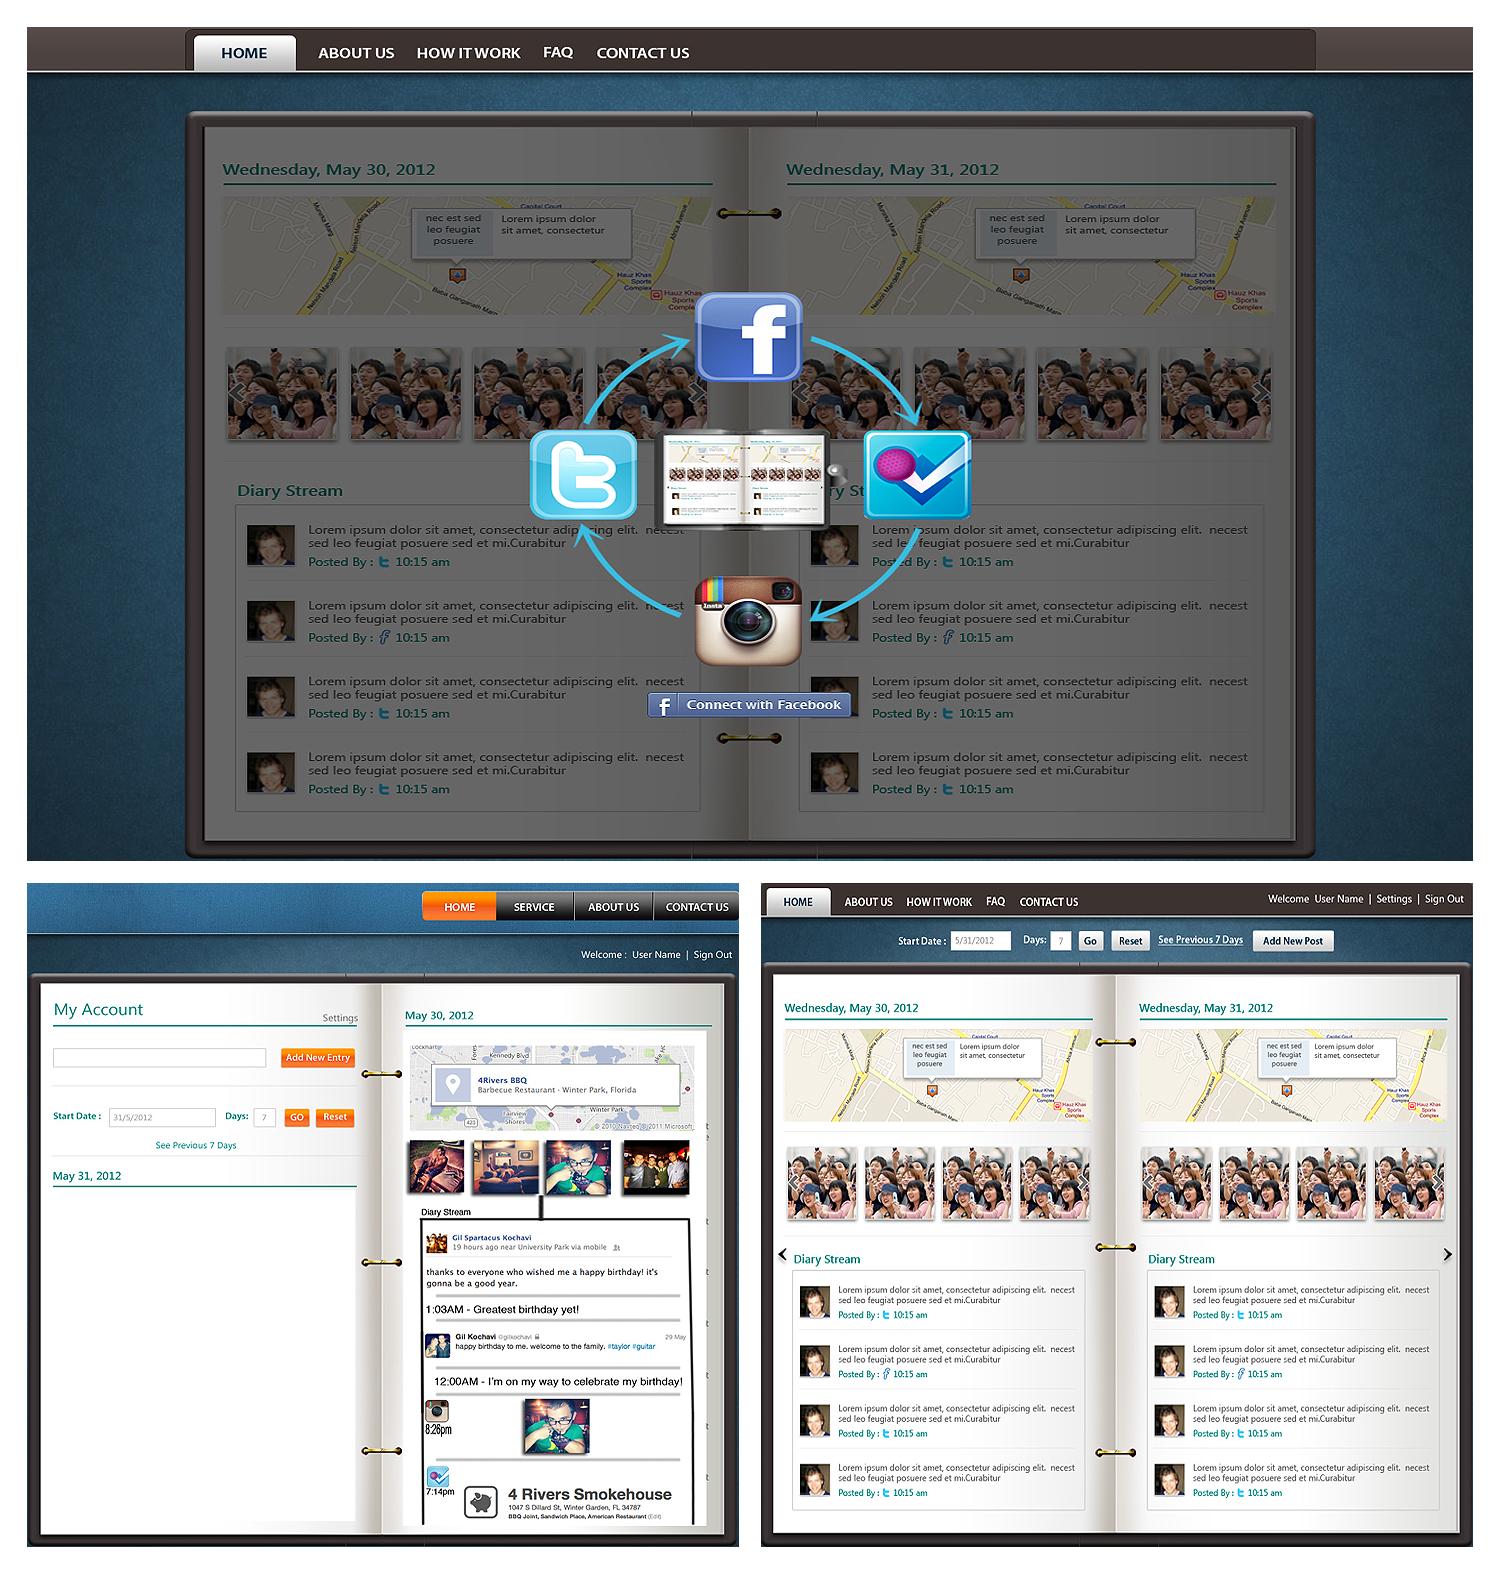 1000 images about web application development on pinterest